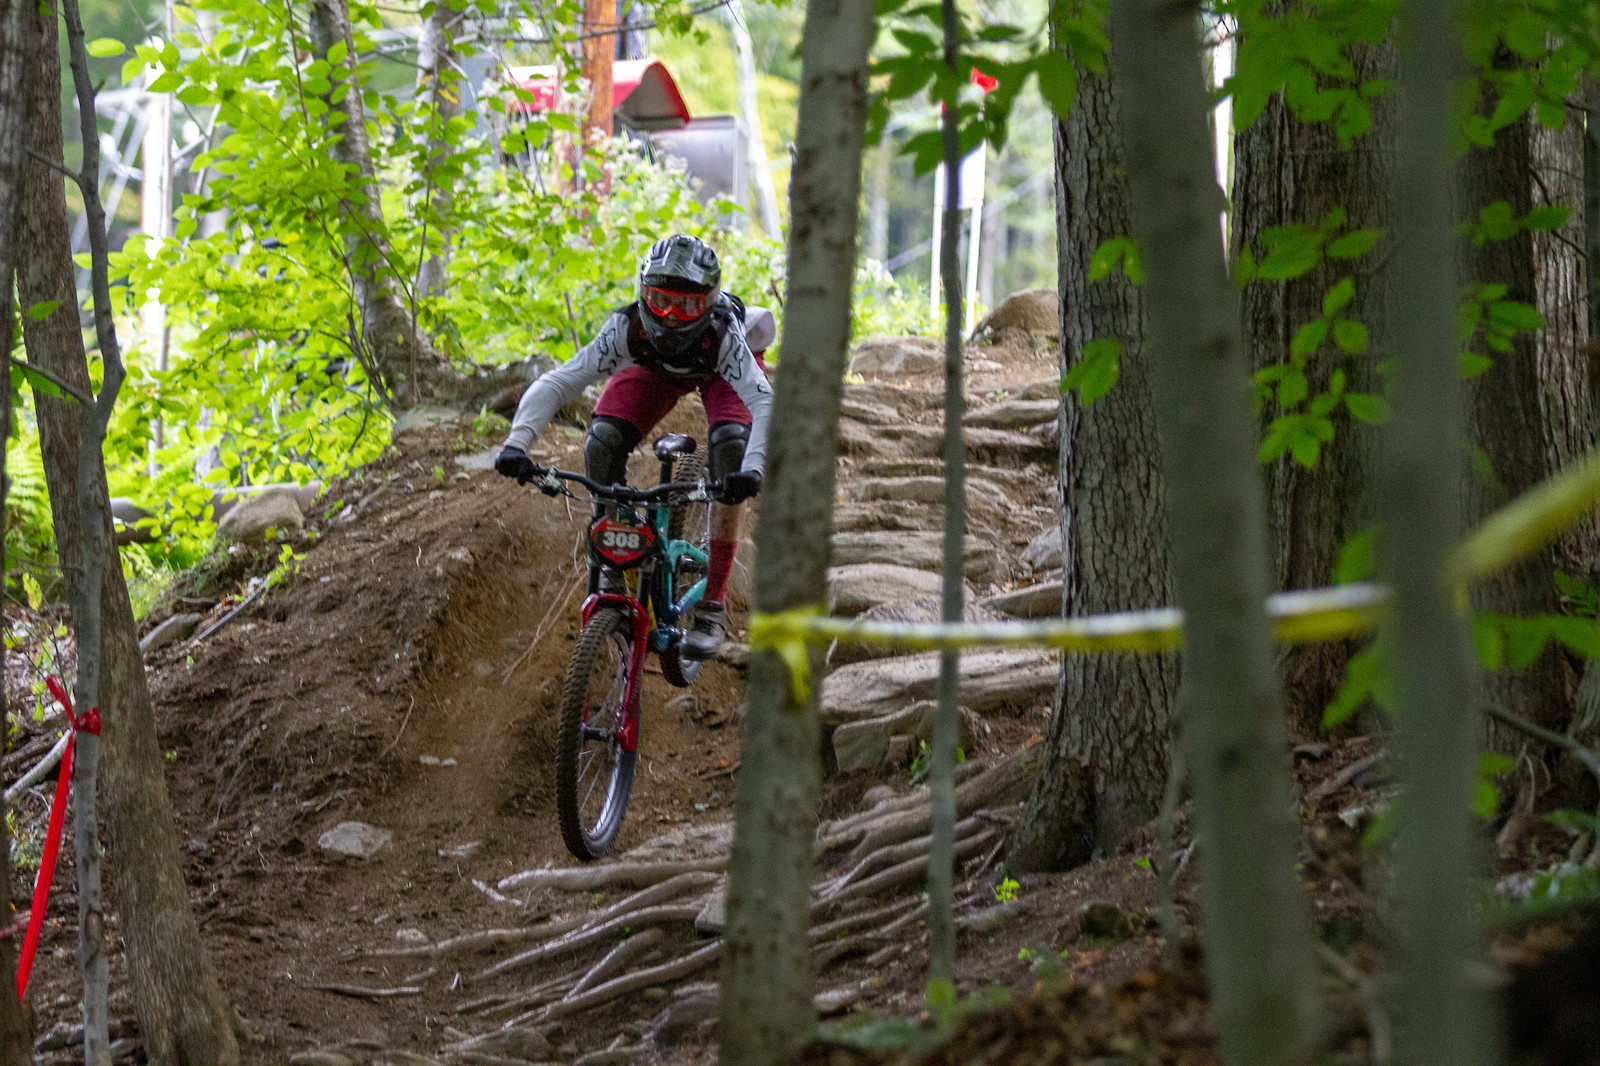 Tristan Lemire - JackRice - Mountain Biking Pictures - Vital MTB